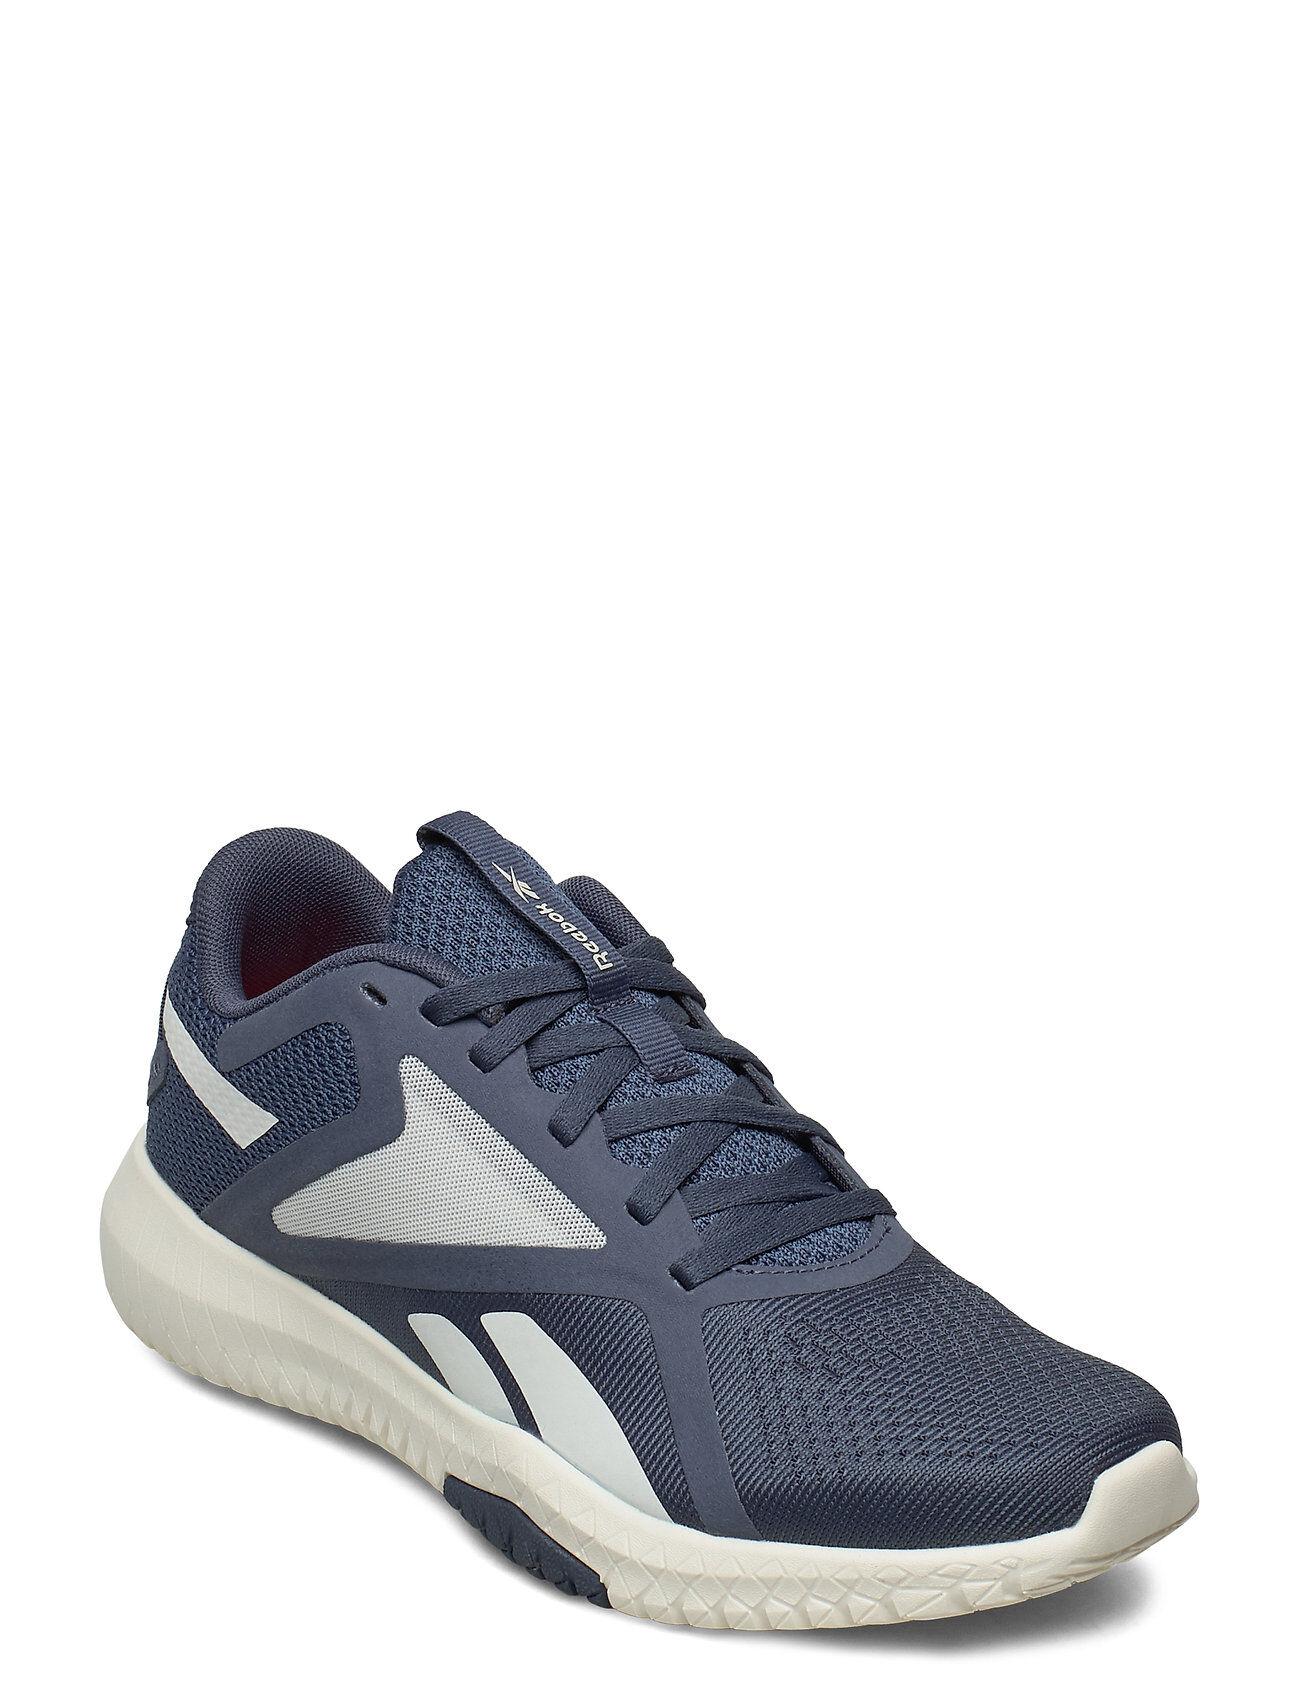 Reebok Performance Reebok Flexagon Force 2.0 Shoes Sport Shoes Running Shoes Liila Reebok Performance